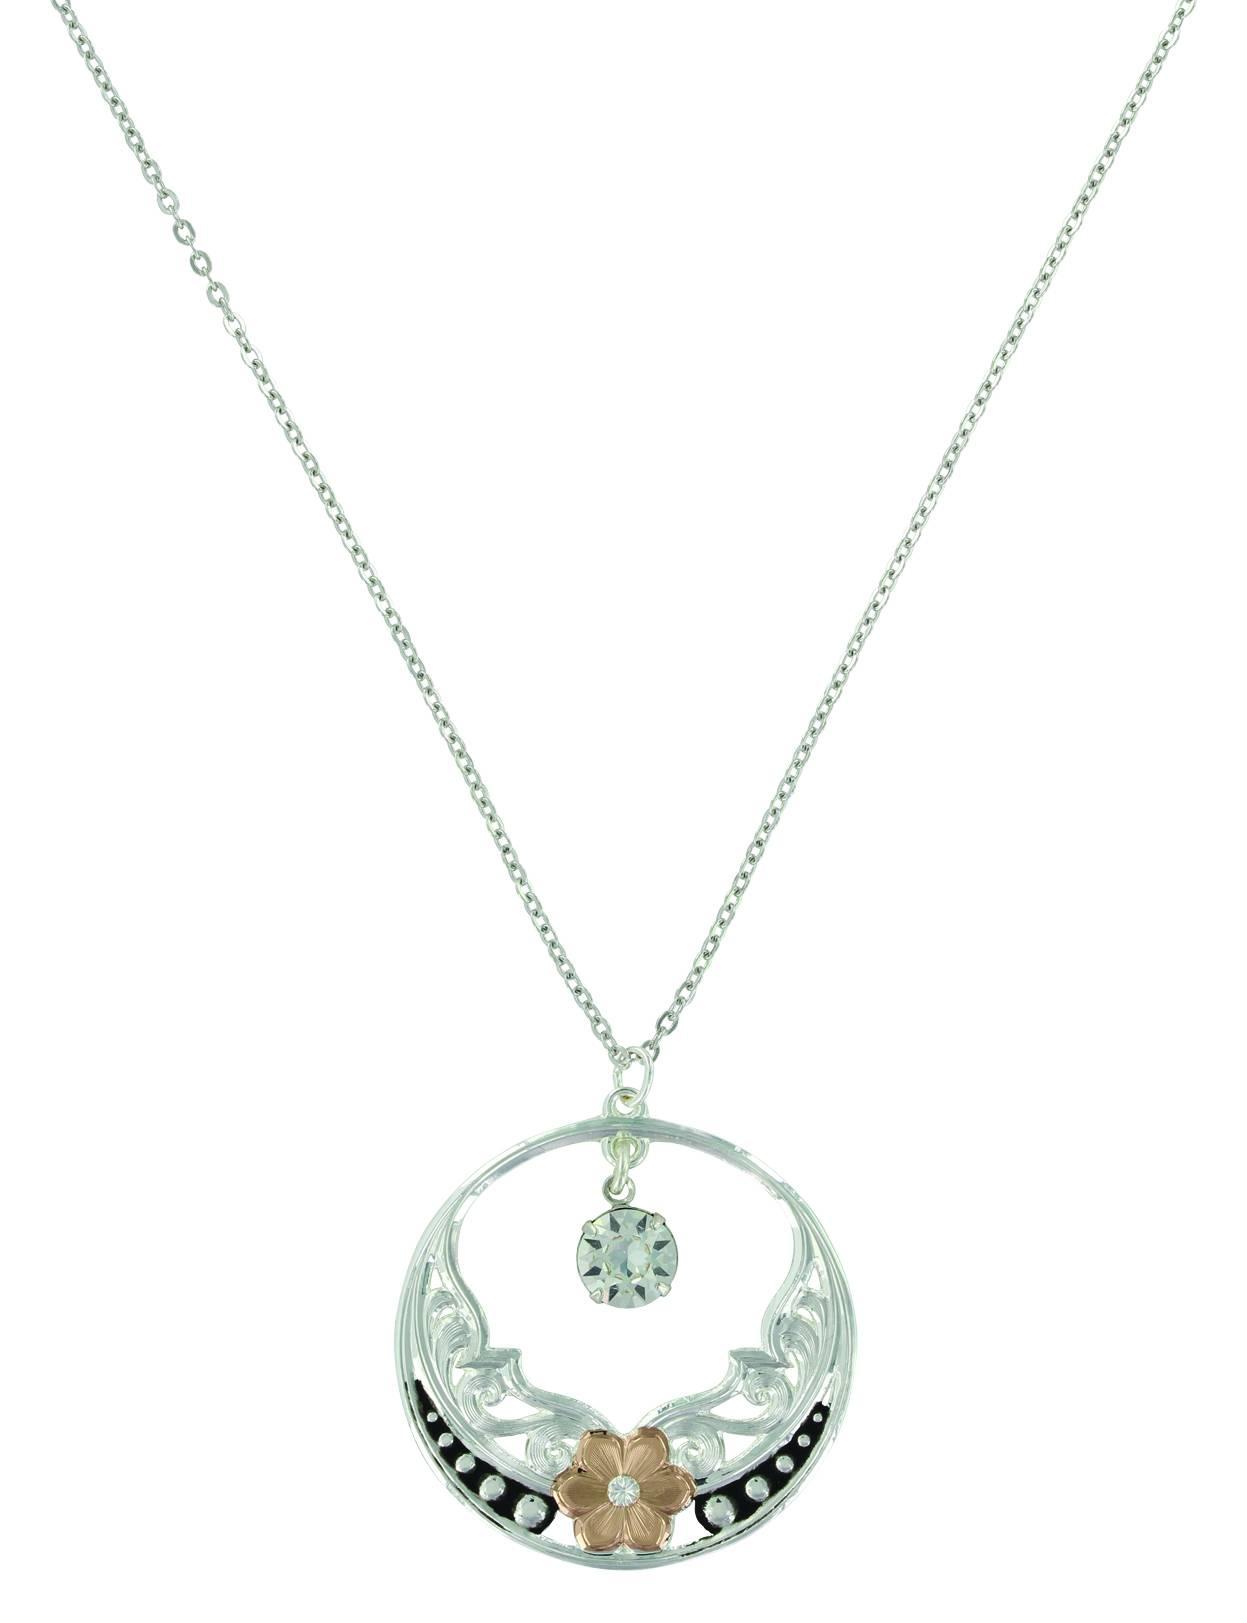 Montana Silver Evening Stars Wild Rose Necklace